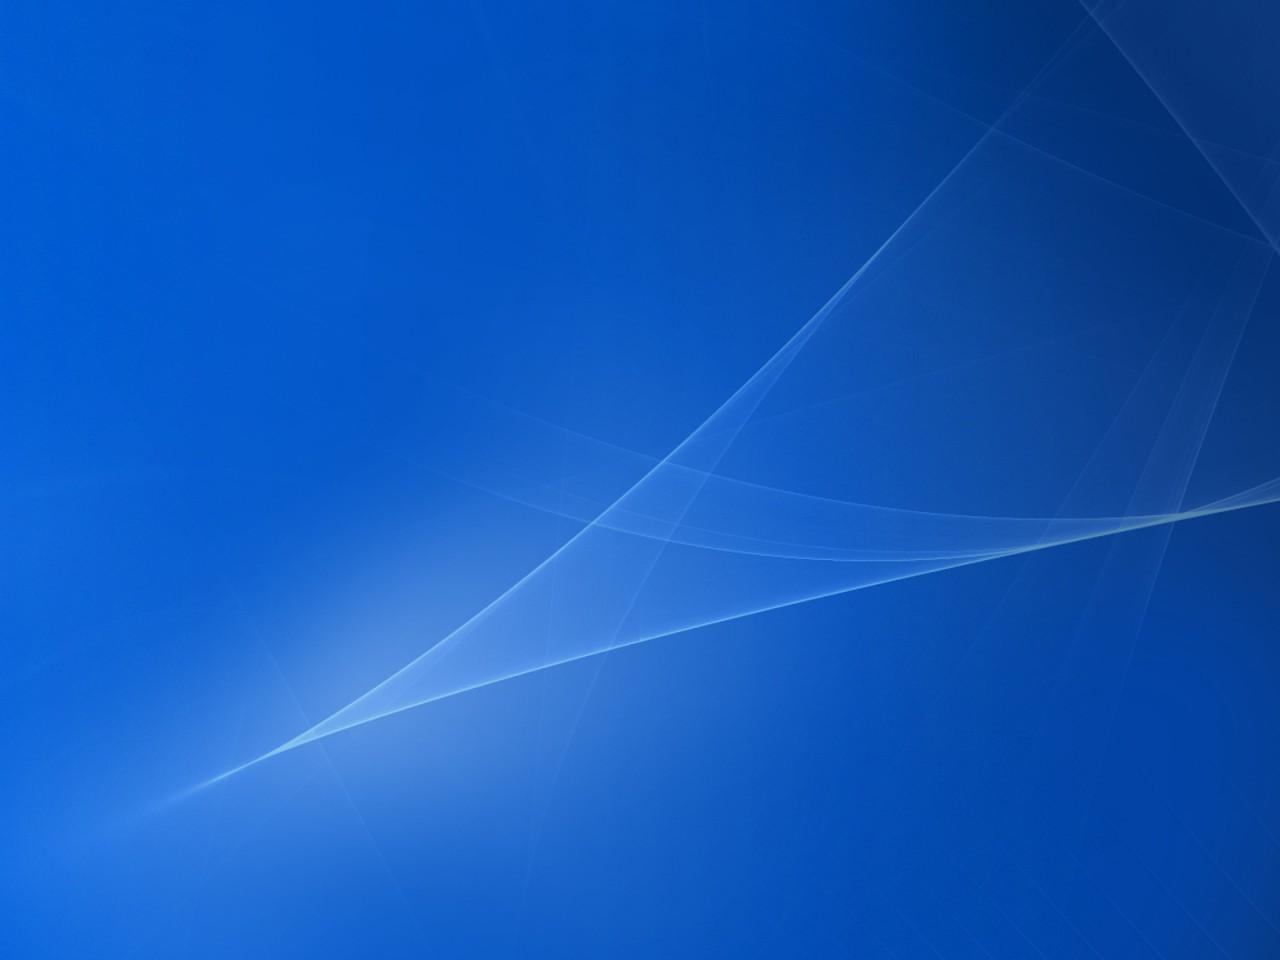 blue background plain